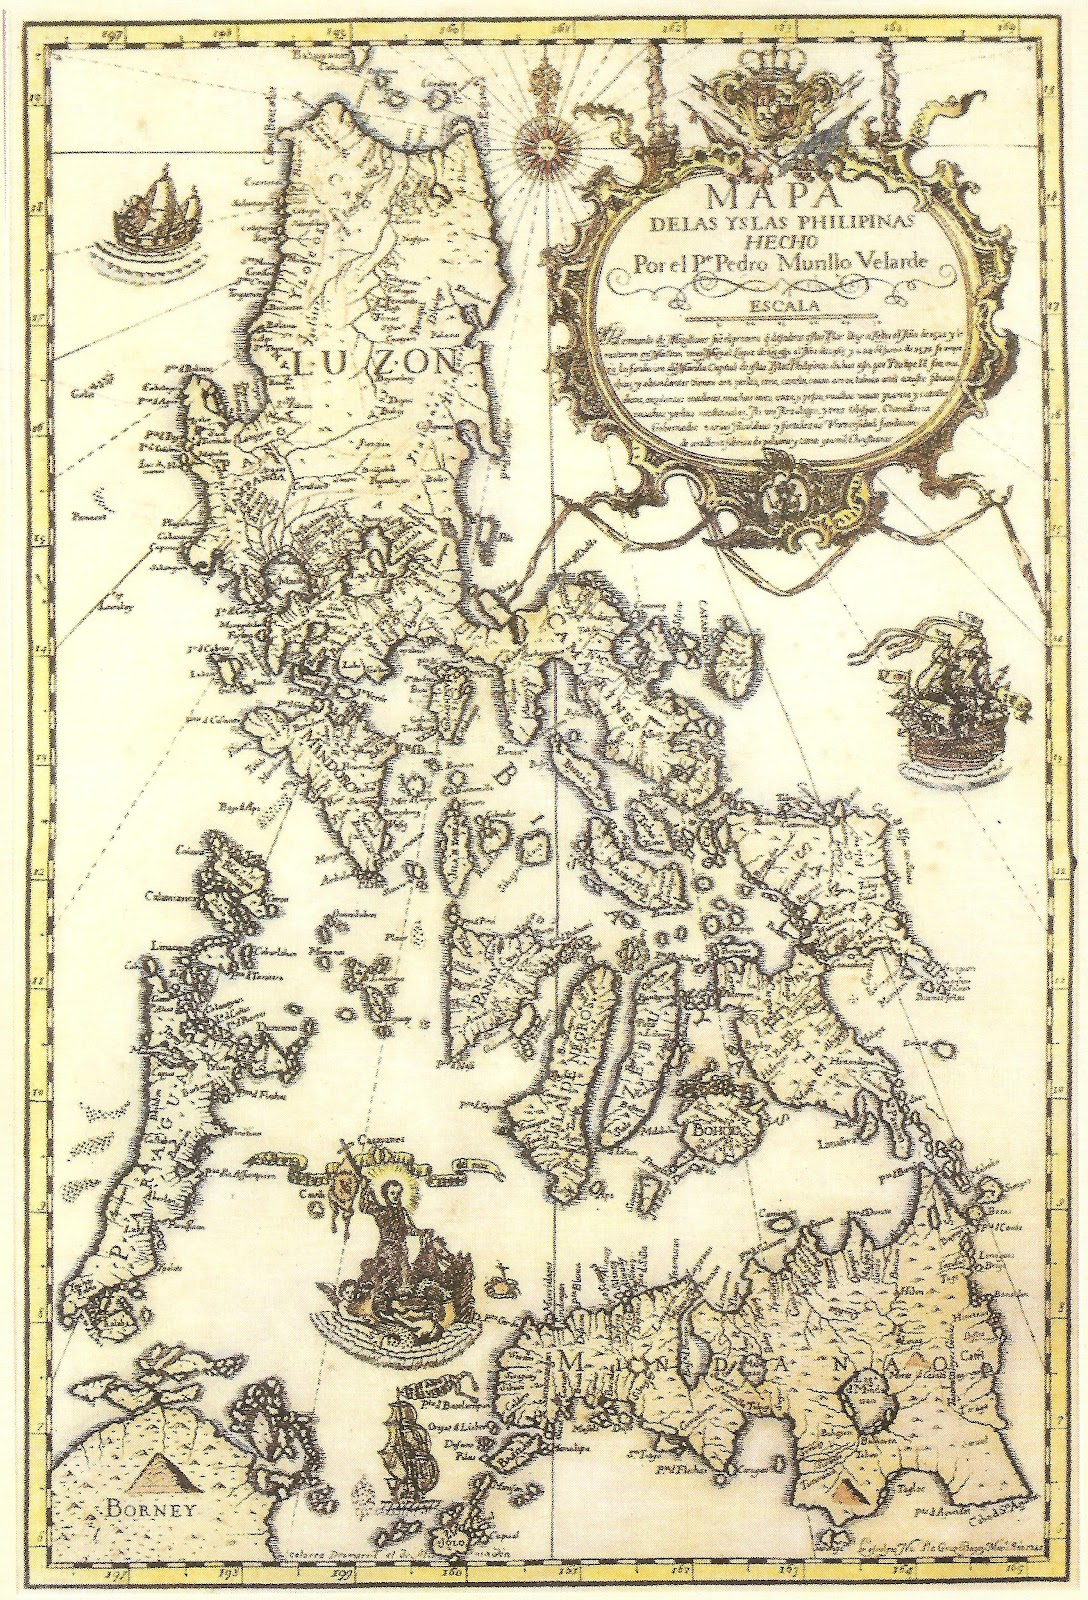 page+28+murillo+map+001 Map Of Abbeville La on map of pointe coupee parish la, map of belle rose la, map of johnson bayou la, map of duson la, map of basile la, map of lake arthur la, map of allen parish la, map of portage la prairie manitoba, map of gray la, map of angola la, map of ball la, map of tallulah la, map of avoyelles parish la, map of rapides parish la, map of st amant la, map of butte la rose la, map of vermilion parish la, map of columbia la, map of louisiana, map of st. francisville la,